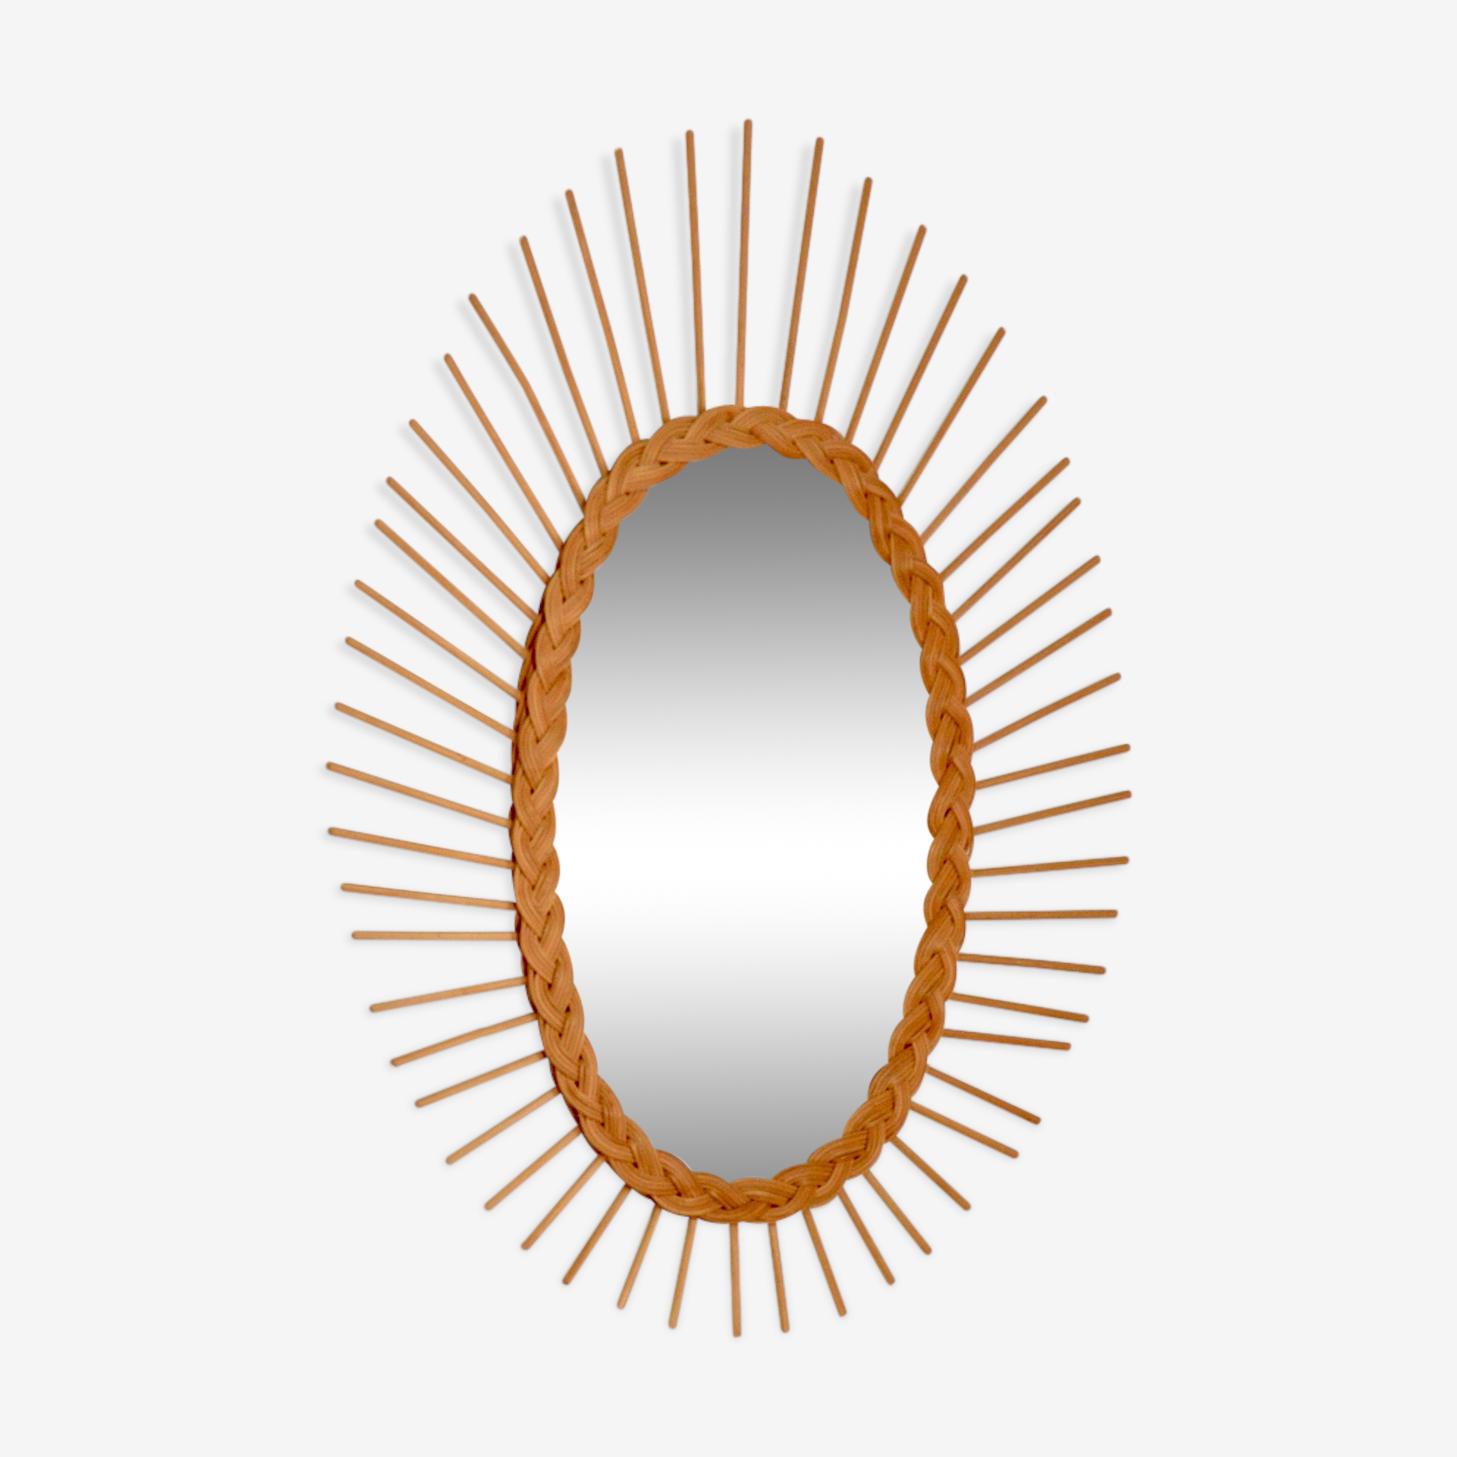 Miroir soleil ovale en rotin 1960 62x45cm